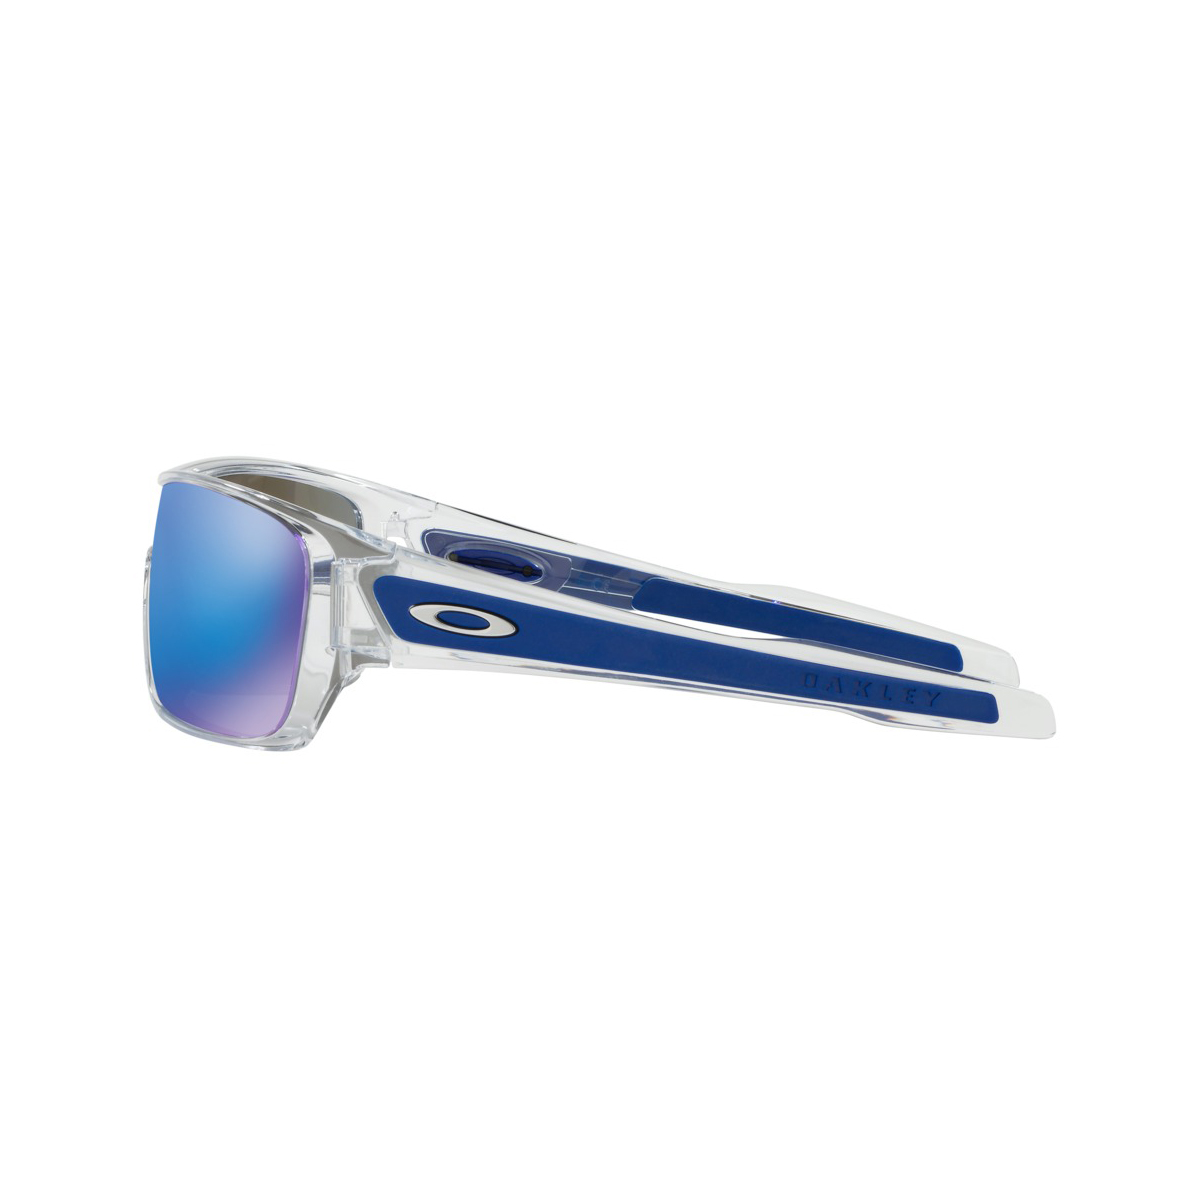 Óculos Oakley Turbine Rotor Polished Clear Lente Sapphire Iridium ... e9a1c68dc2